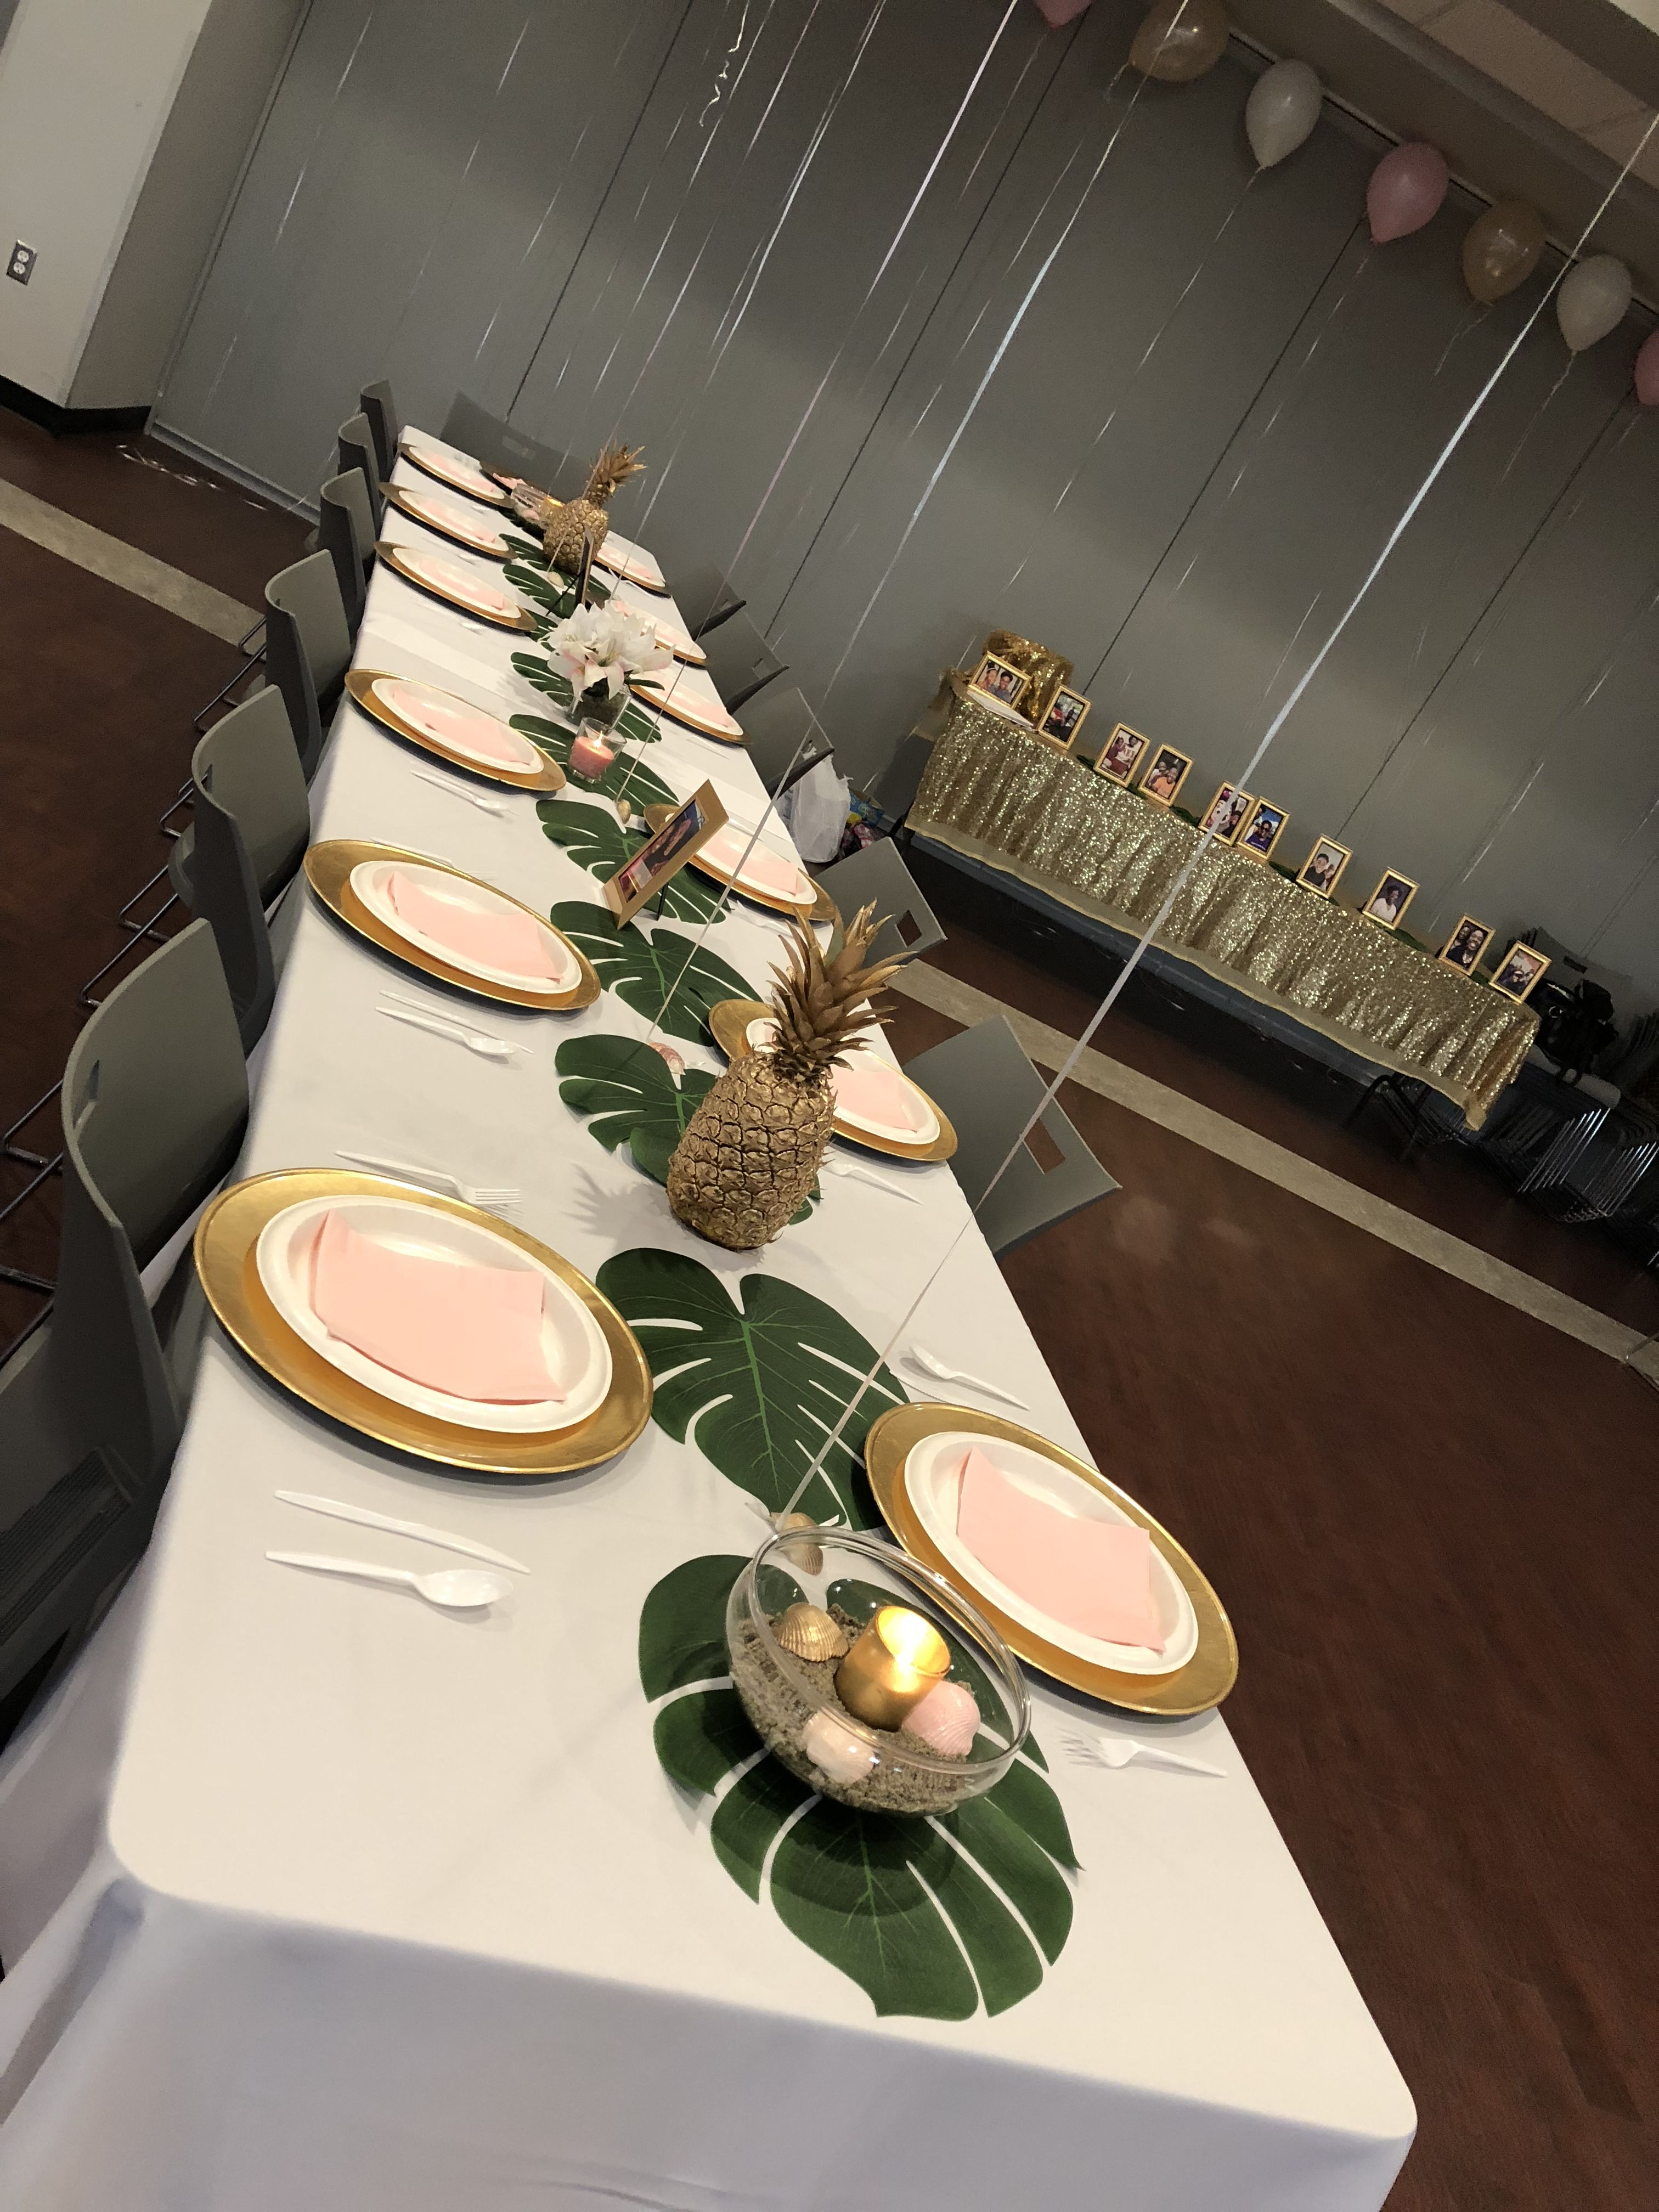 Tropical Theme Luau Table Setting